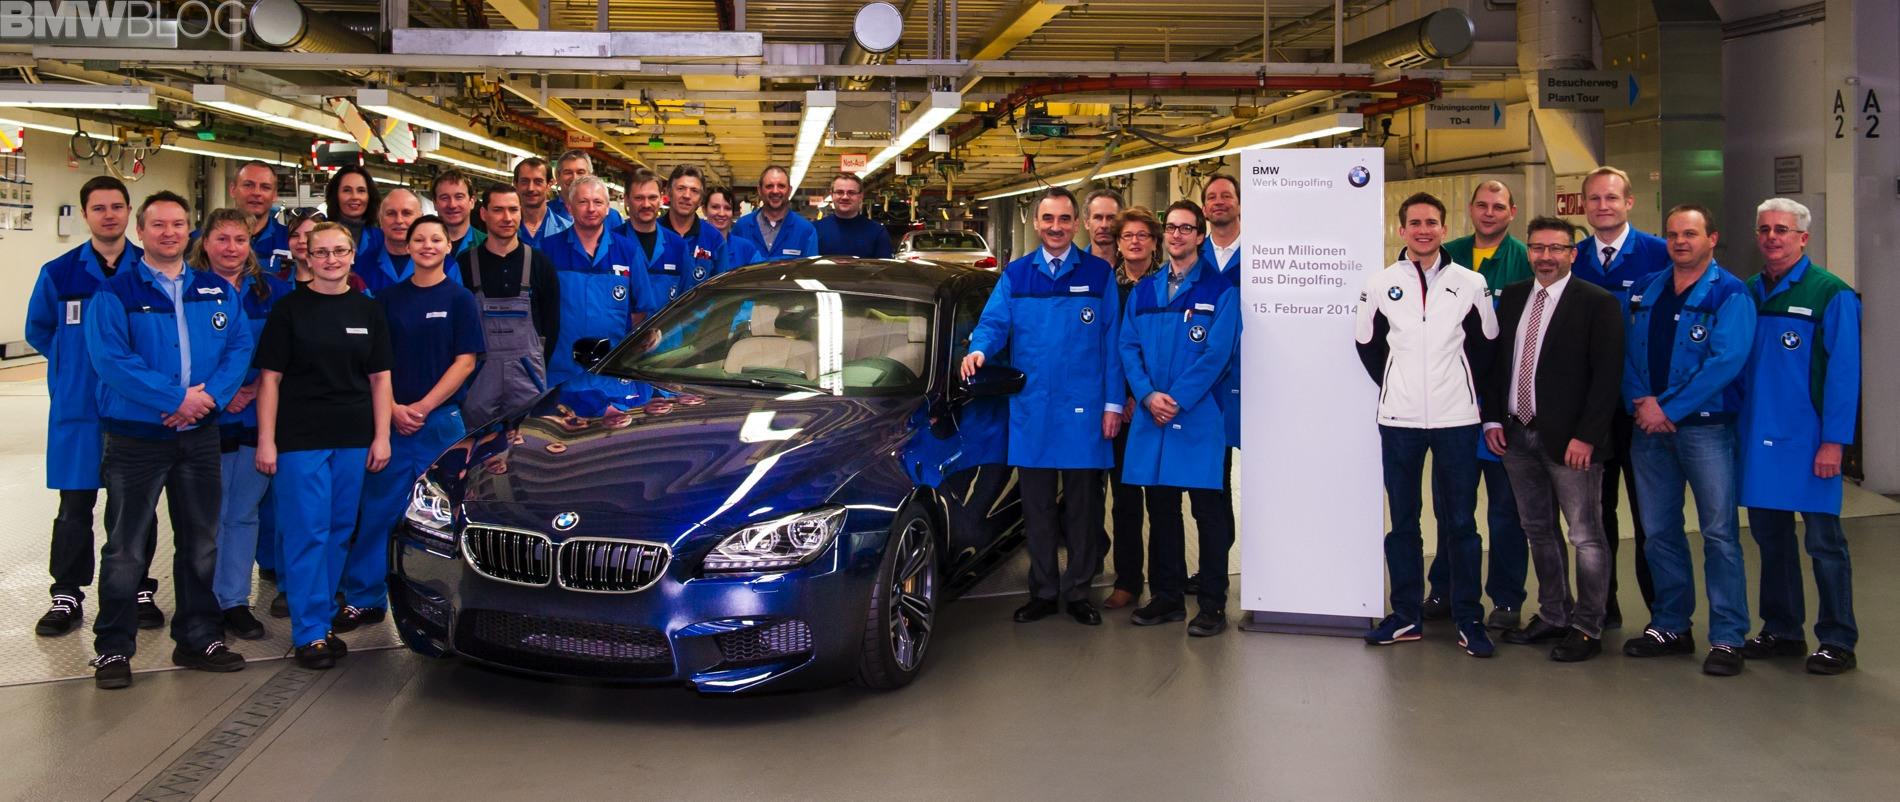 [Actualité] Groupe BMW - Page 16 Bmw-m6-gran-coupe-dingolfing-02